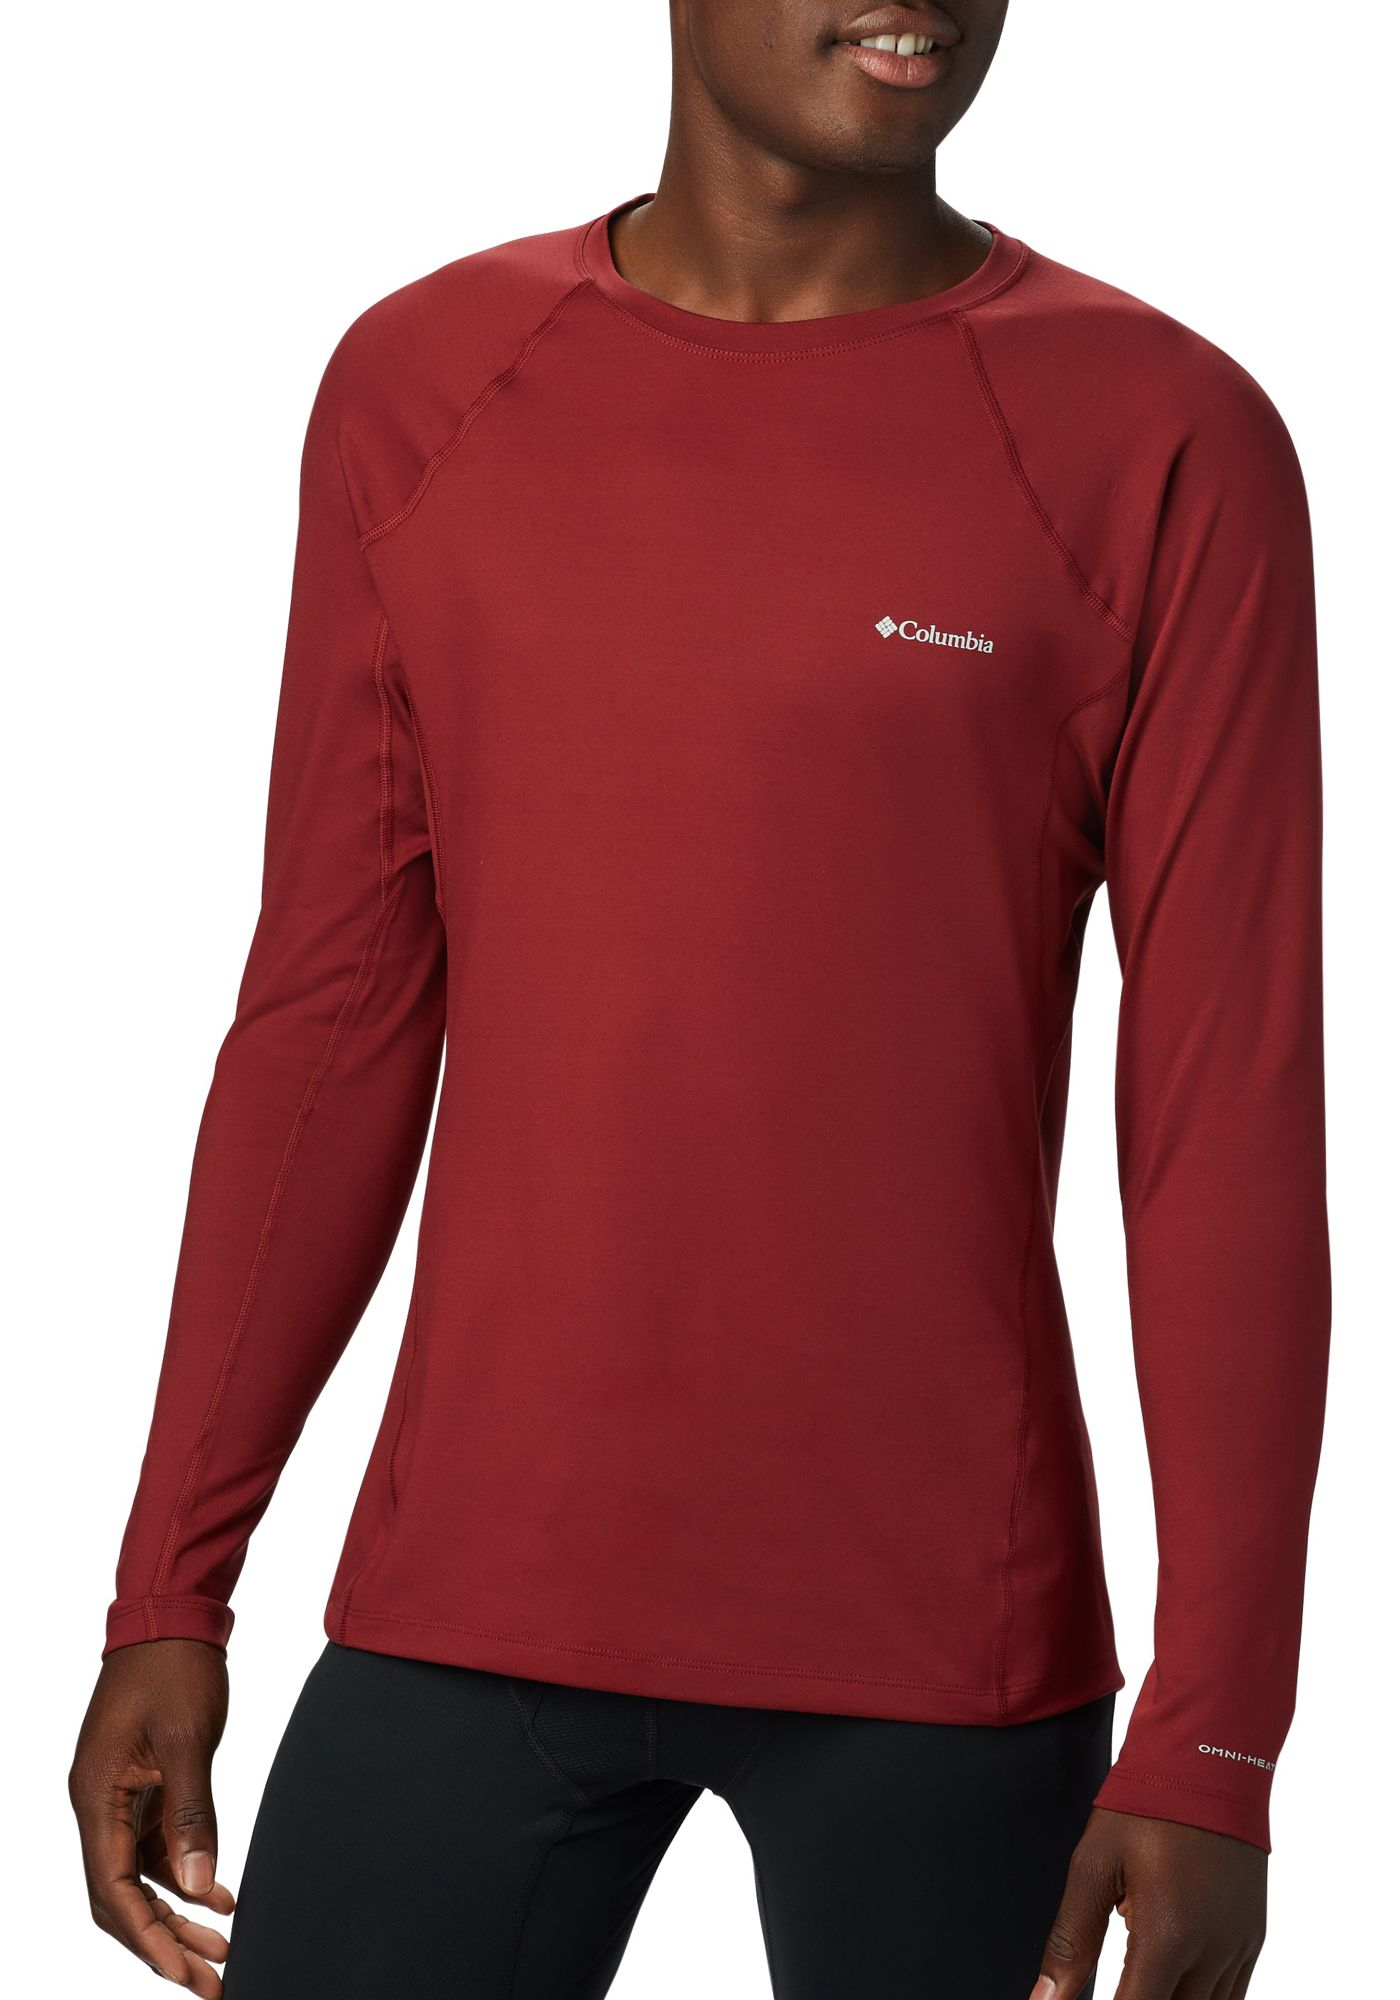 Columbia Men's Heavyweight Stretch Long Sleeve Shirt